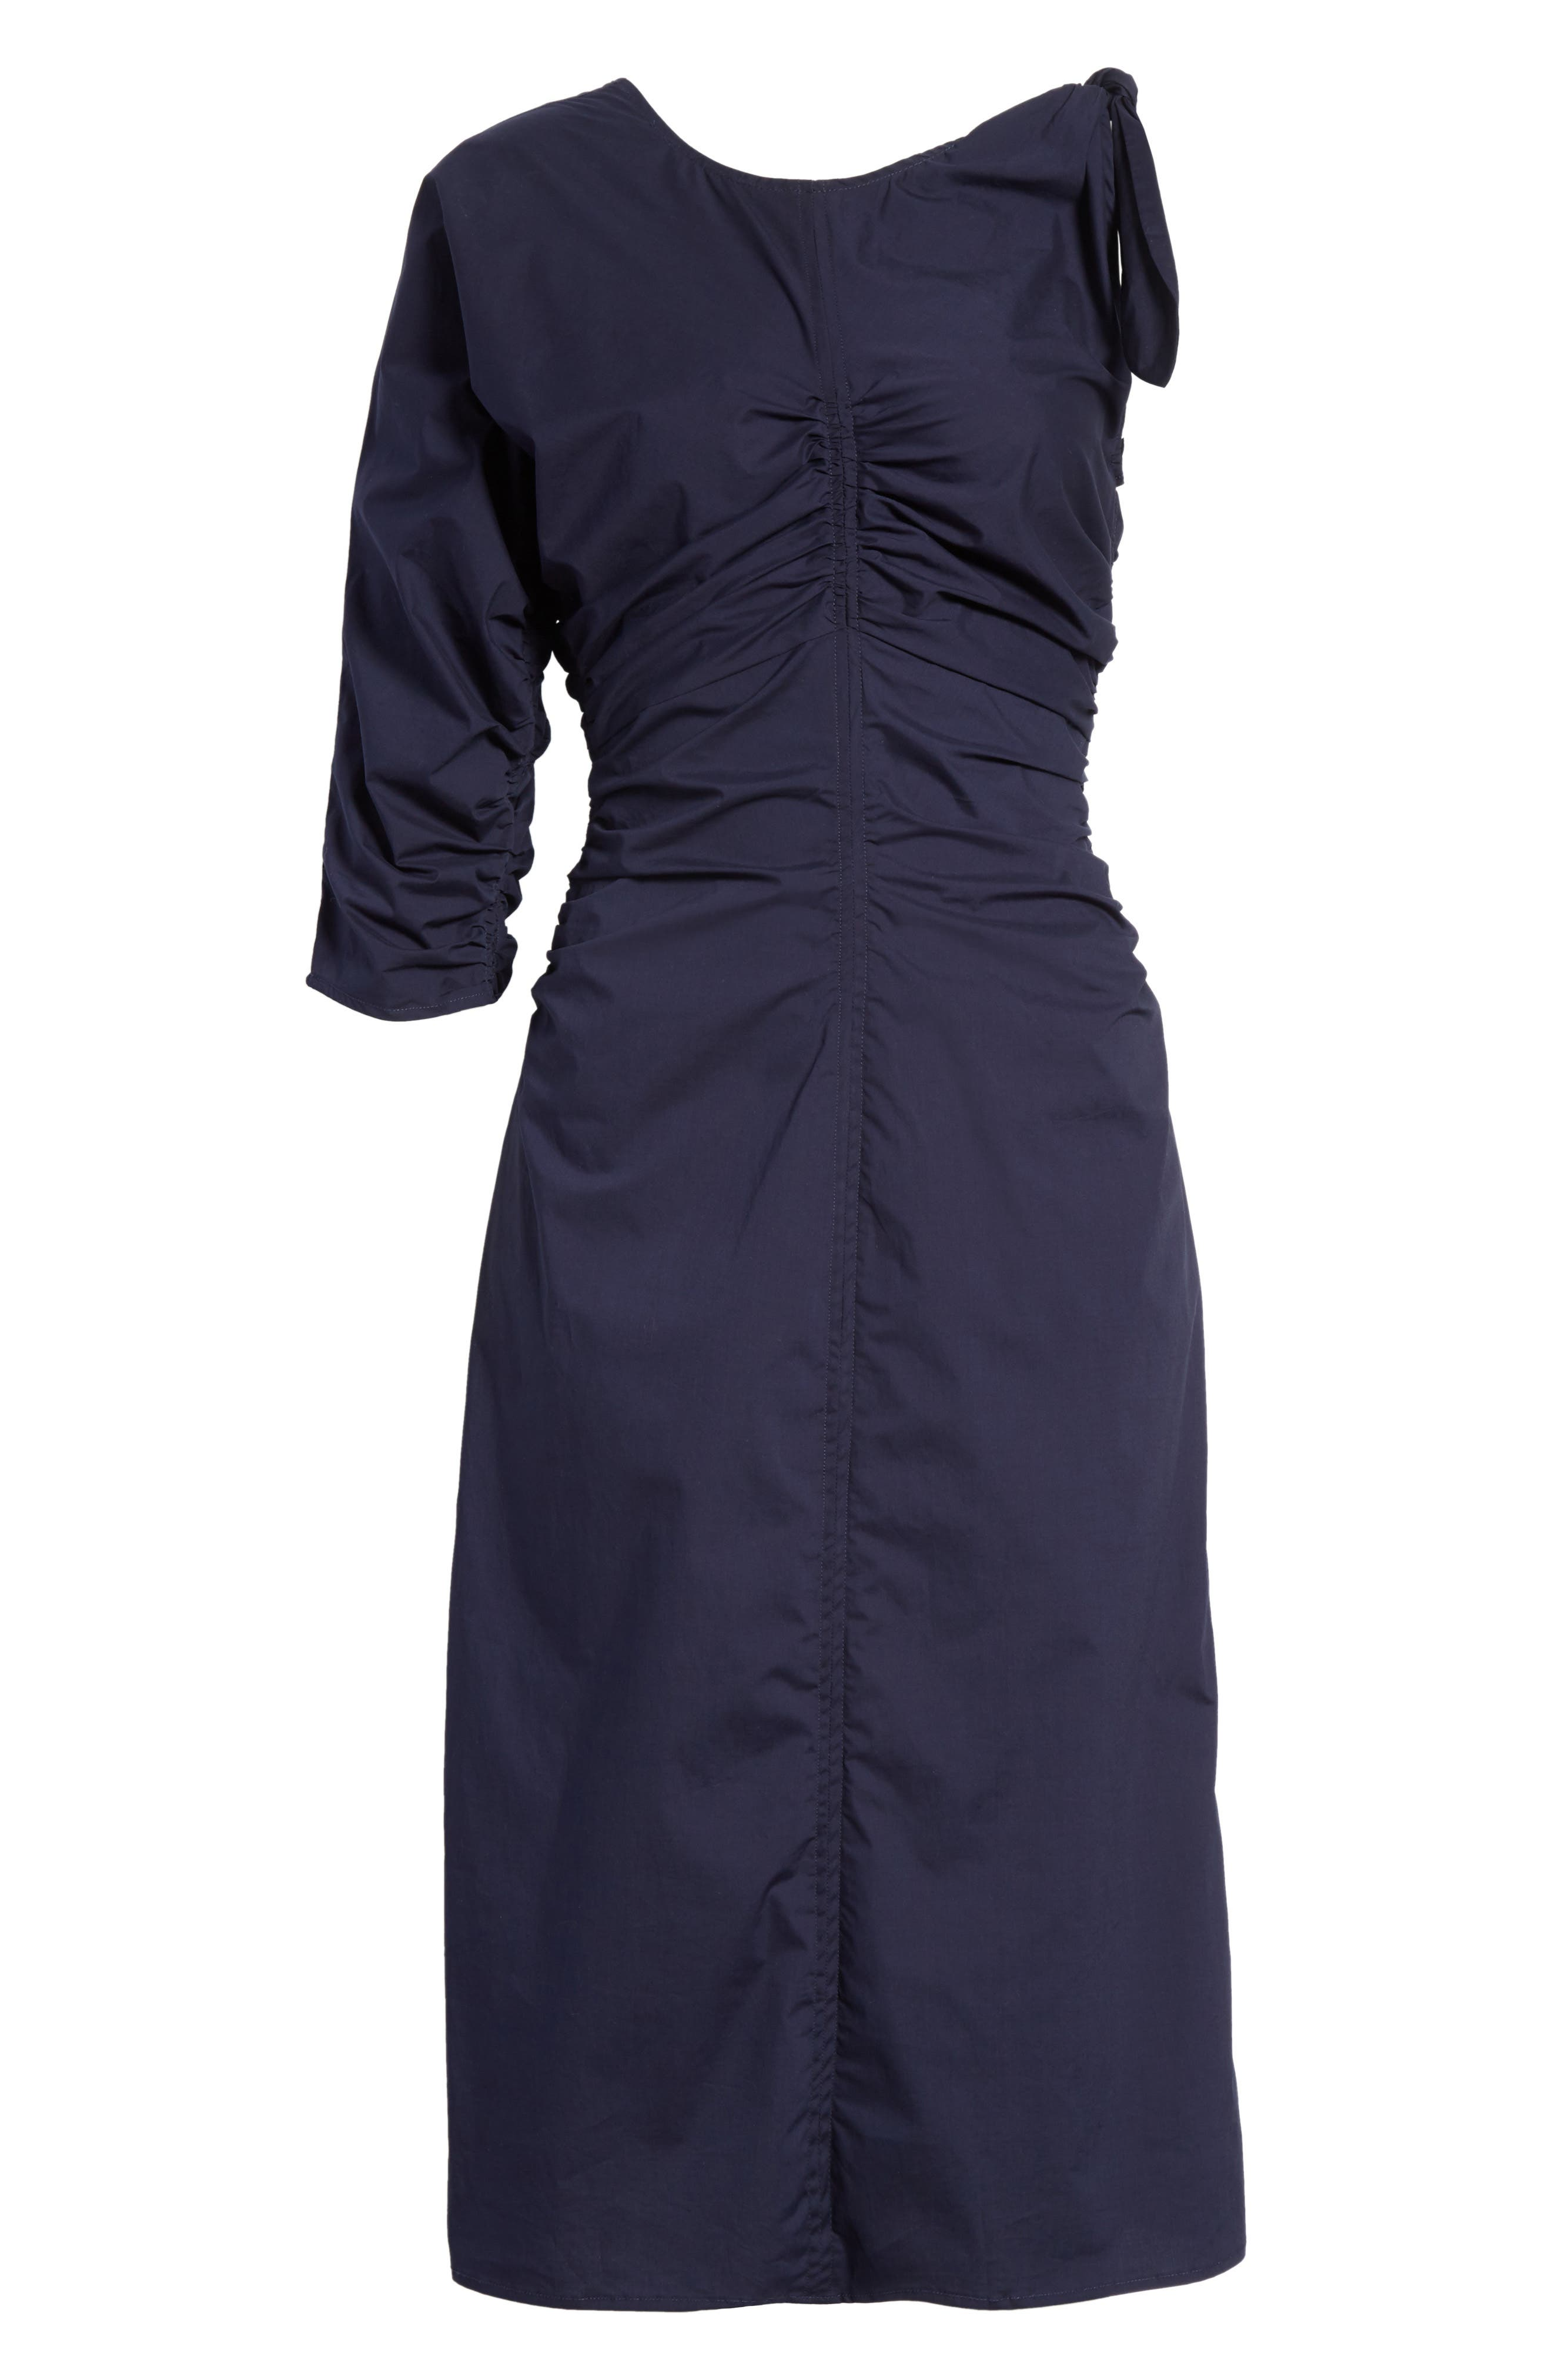 Clota Ruched One-Shoulder Poplin Dress,                             Alternate thumbnail 6, color,                             400